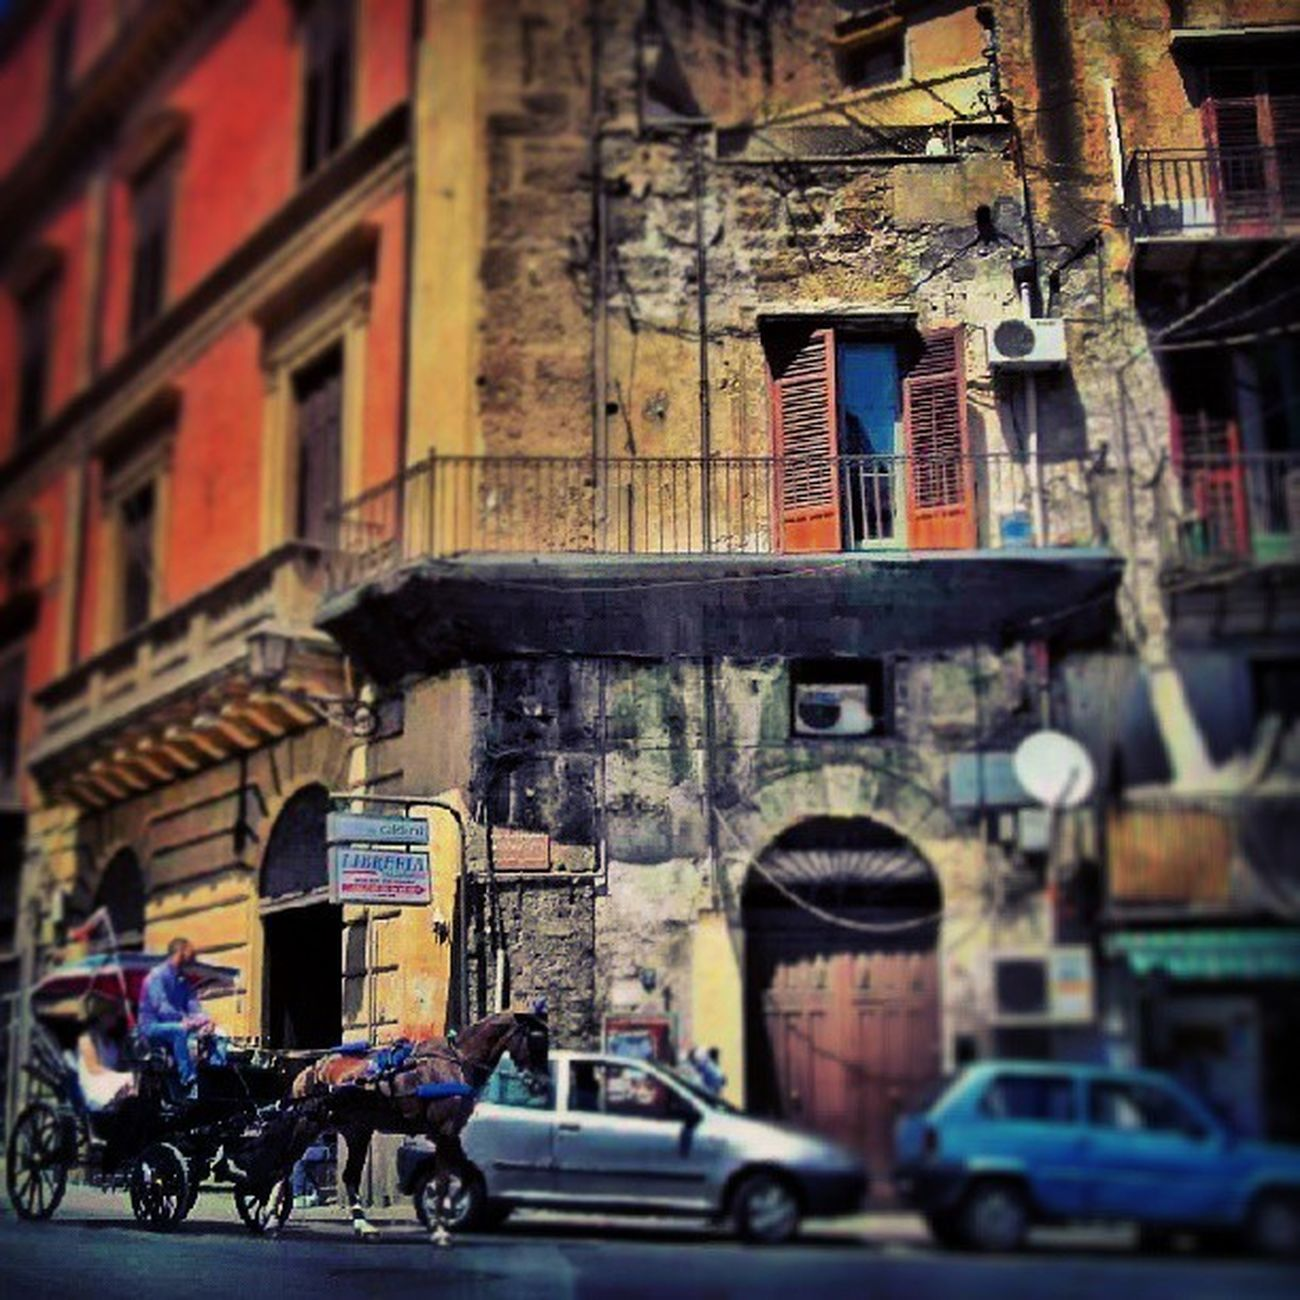 Sicilya Sicily Scilia Italya italy palermo street streetlife life igers igbox latergram instago instamag instacool instagood instafollow instadaily follower followme follow4follow follow followback followme webstagram tweegram traffic horse